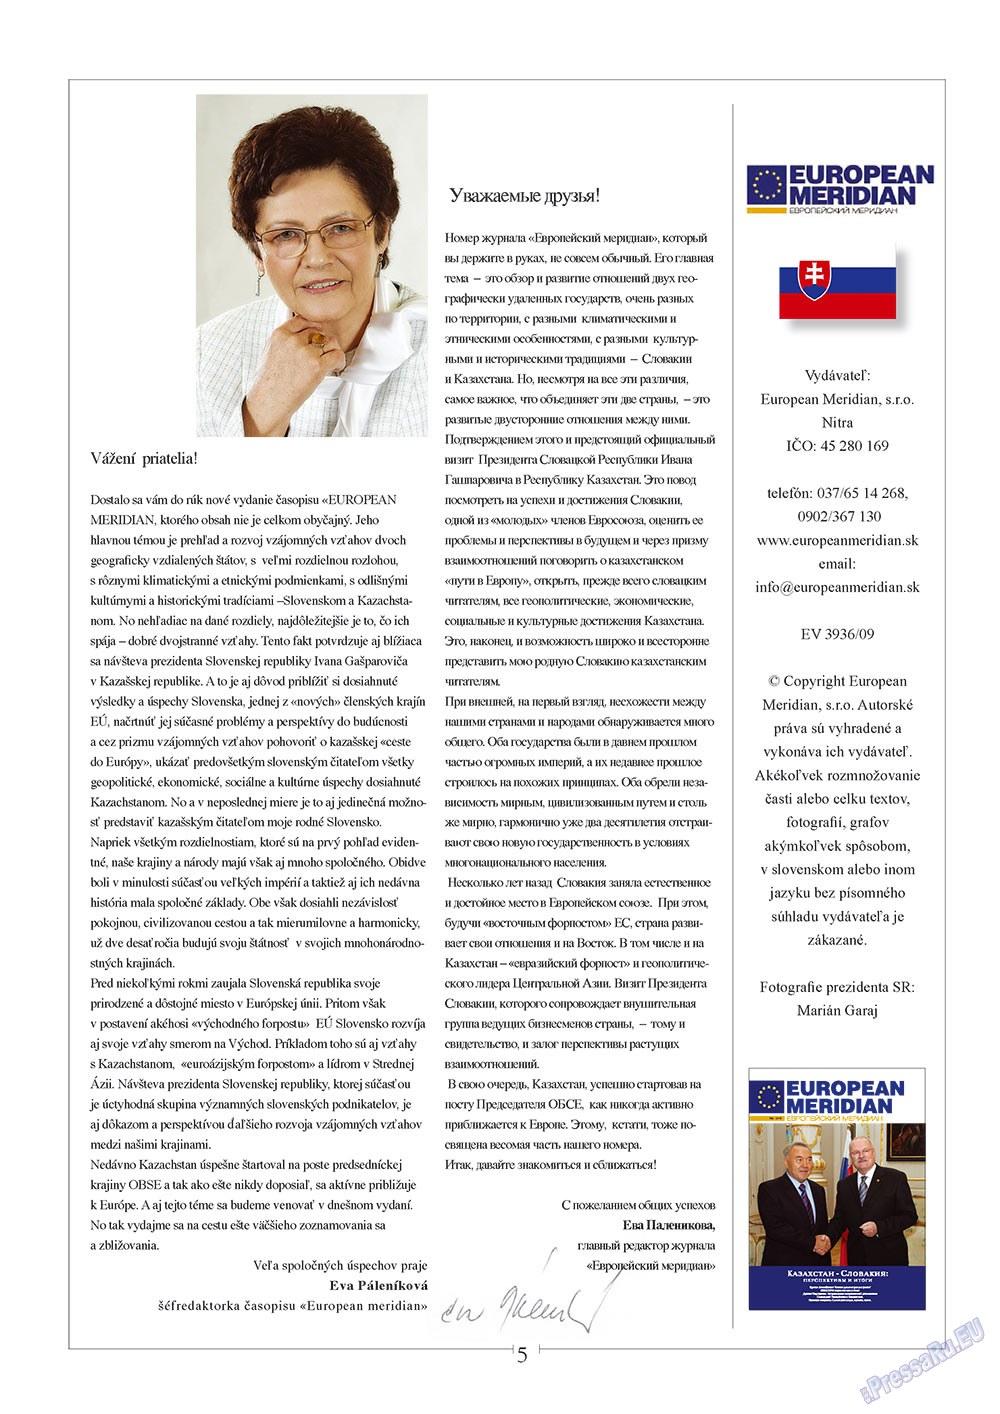 Европейский меридиан (журнал). 2010 год, номер 2, стр. 5